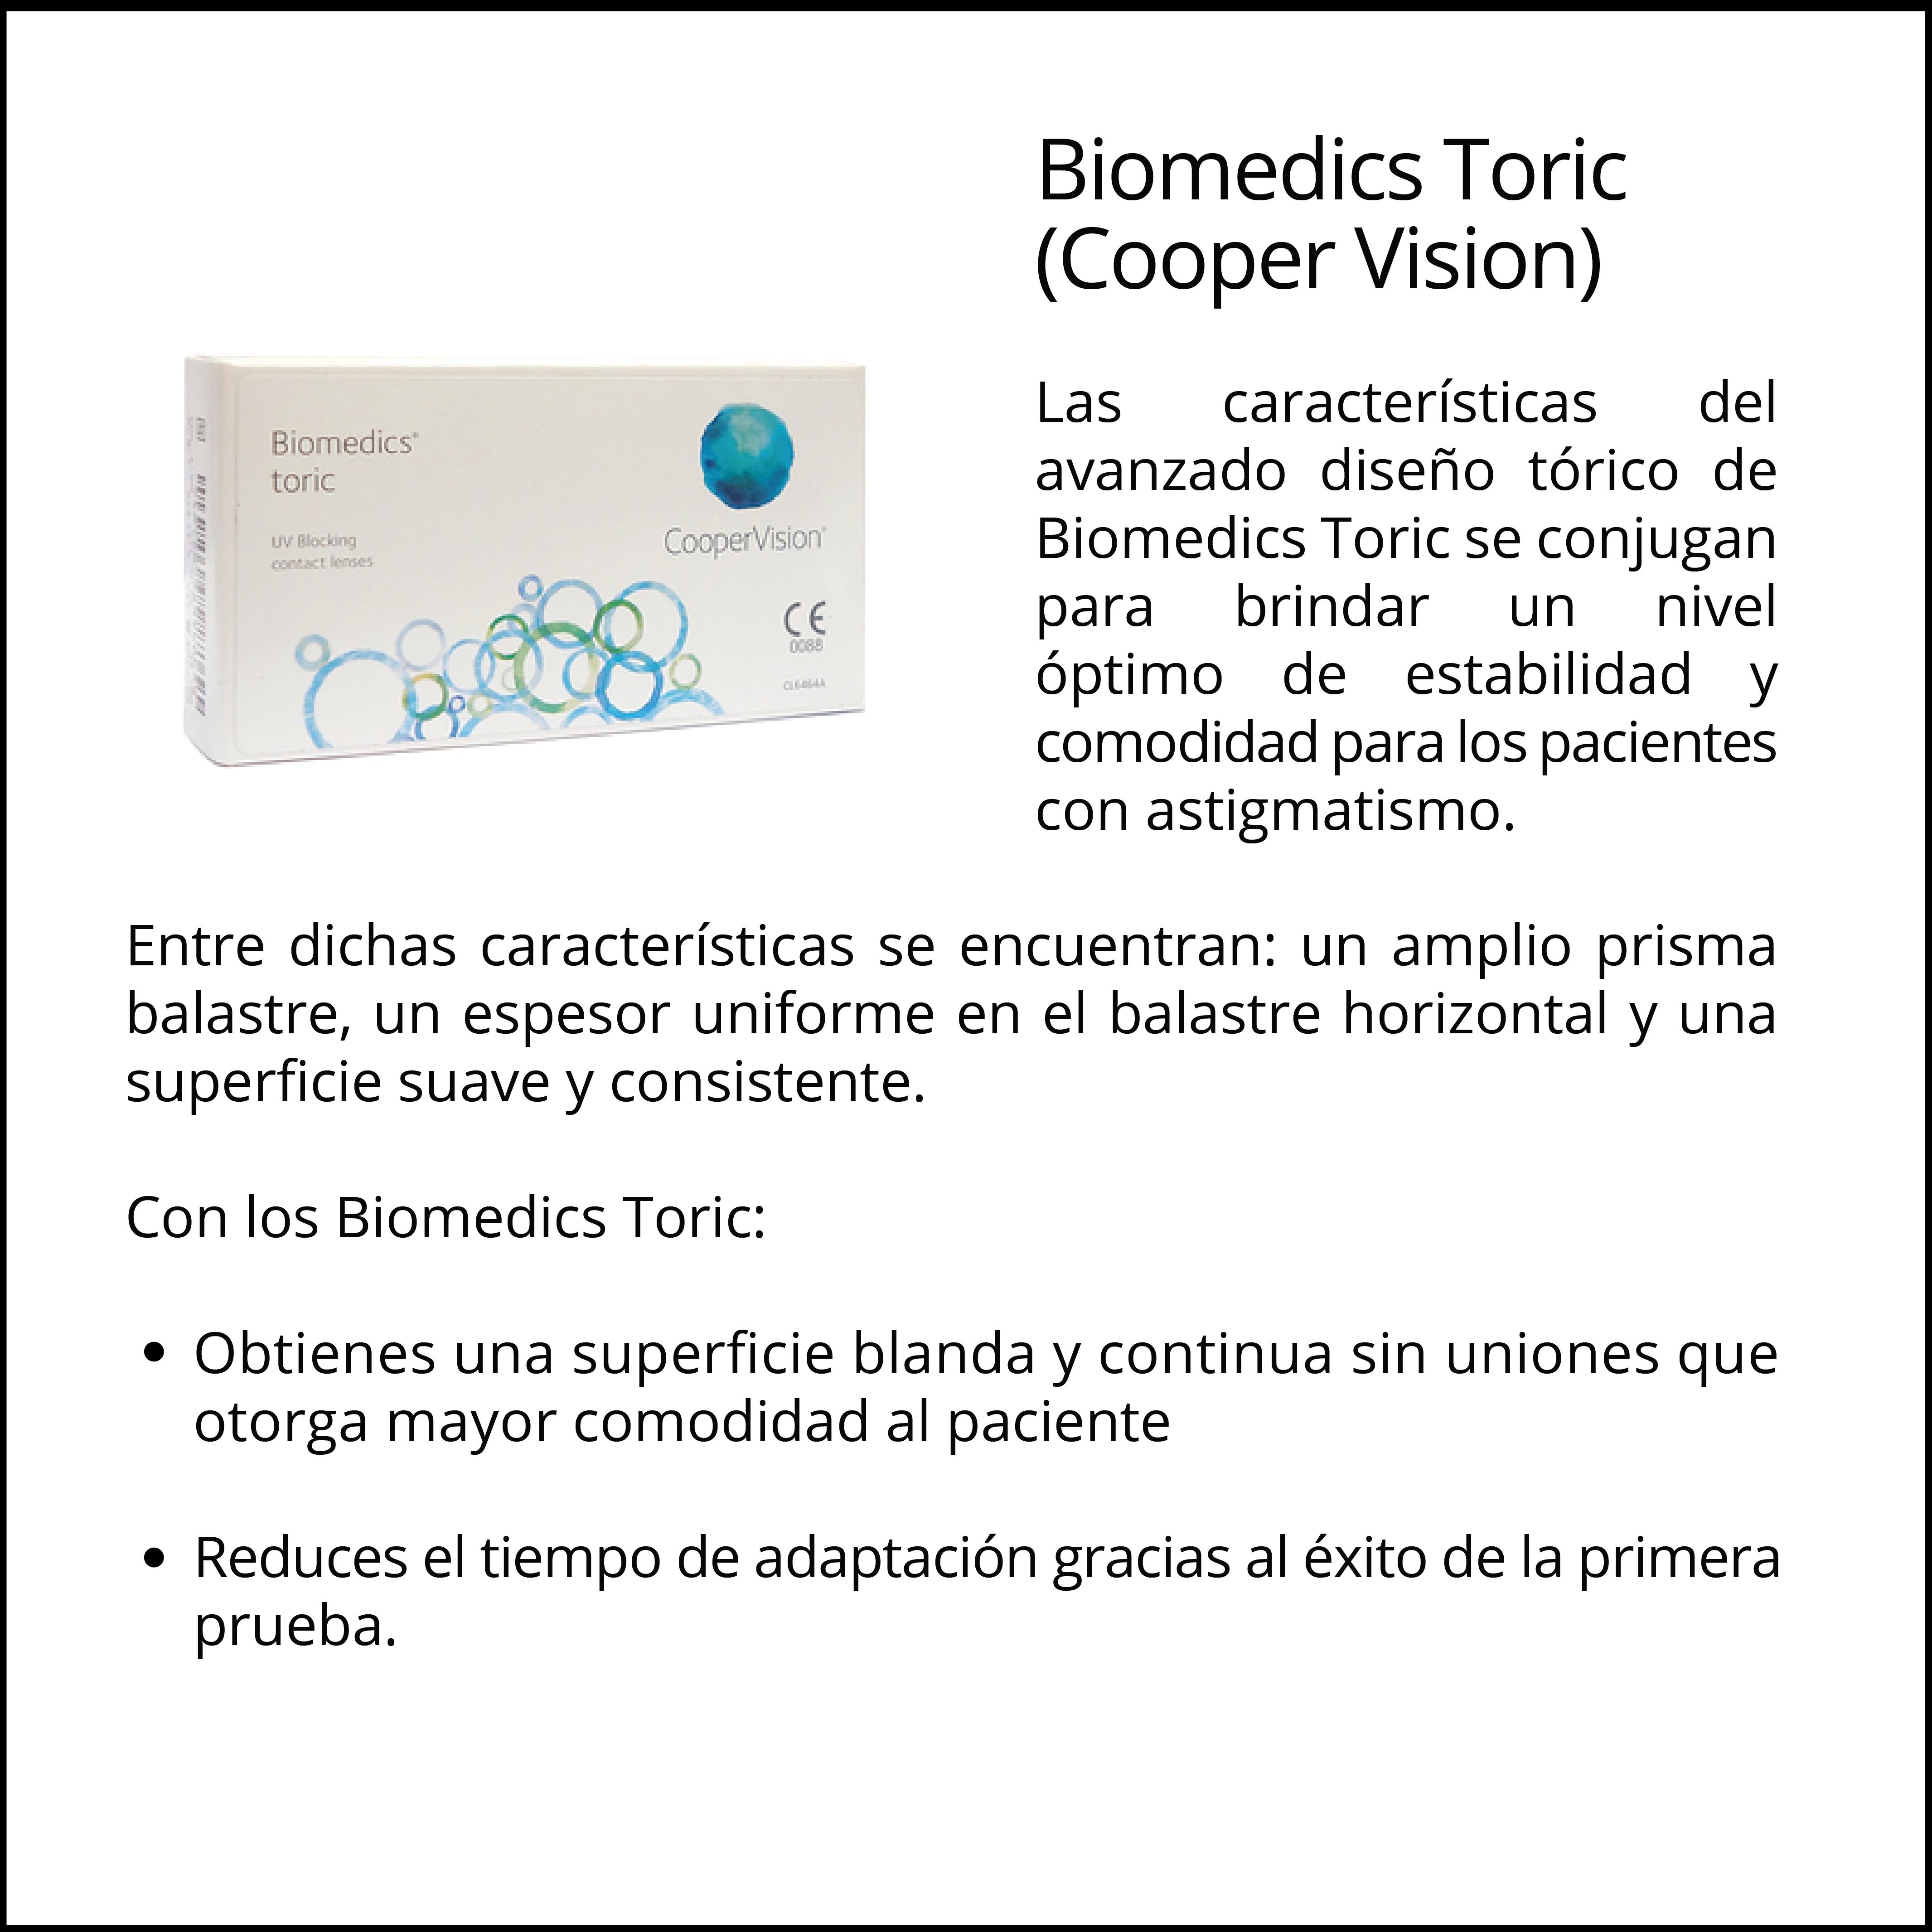 lc-blandostormensual-02